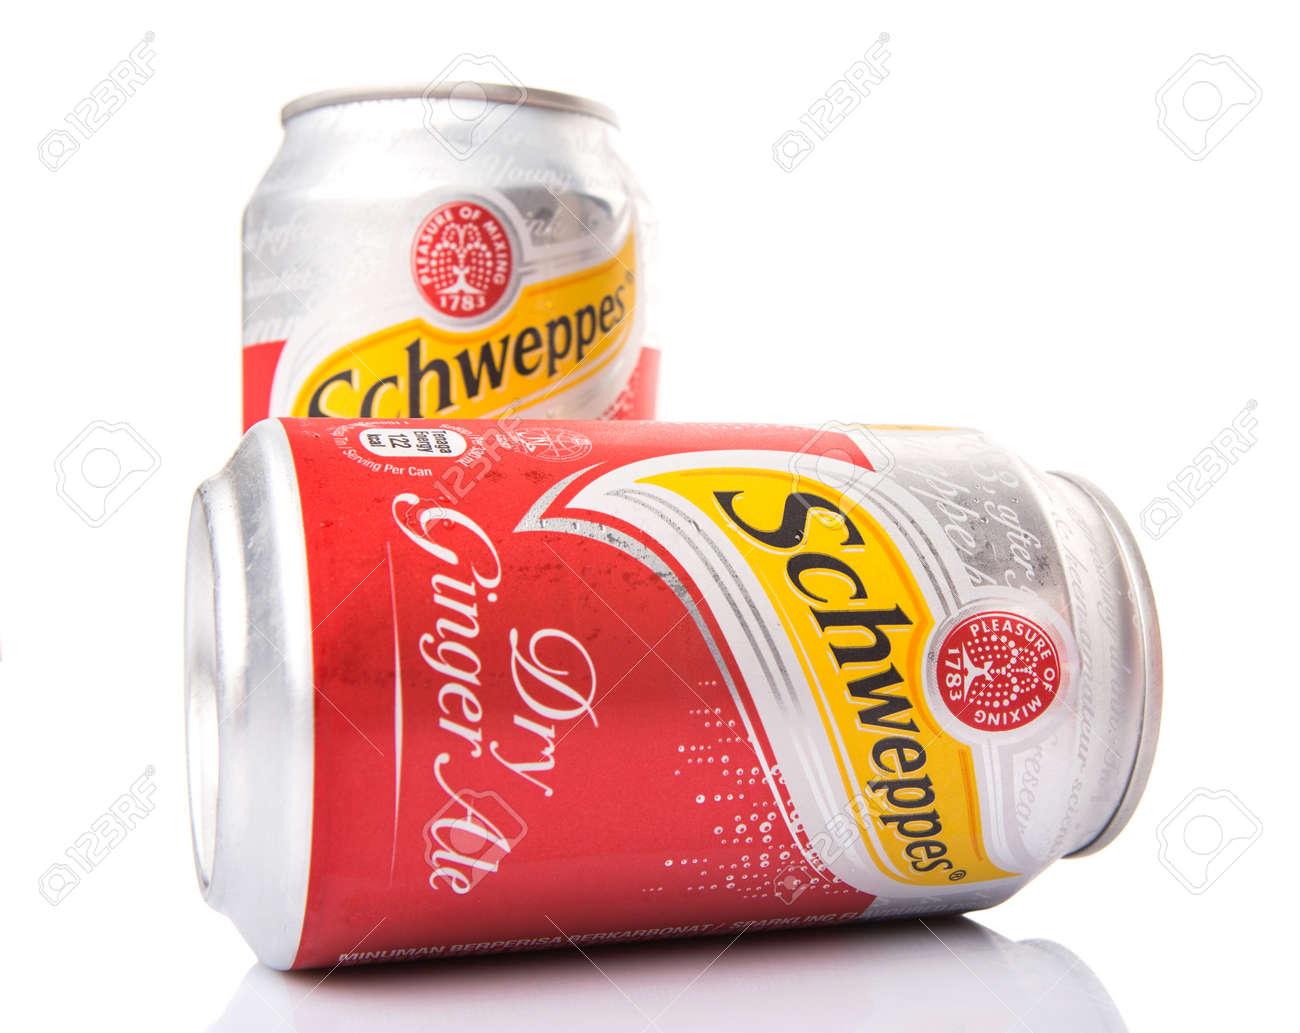 KUALA LUMPUR, MALAYSIA - JANUARY 30TH 2015  Schweppes is a beverage